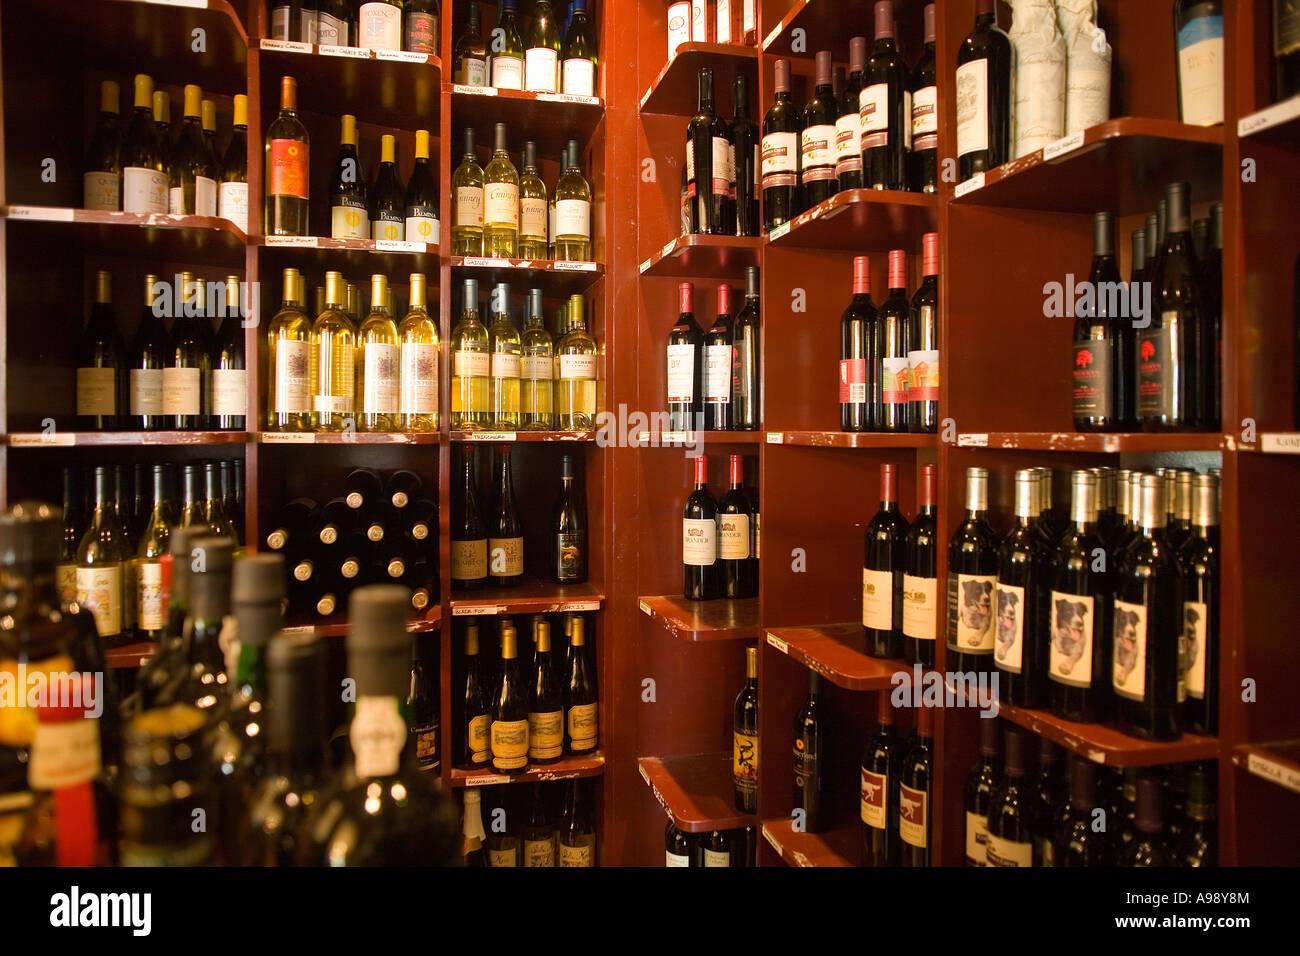 Wine And Liquor Storage Room Stock Photo Royalty Free